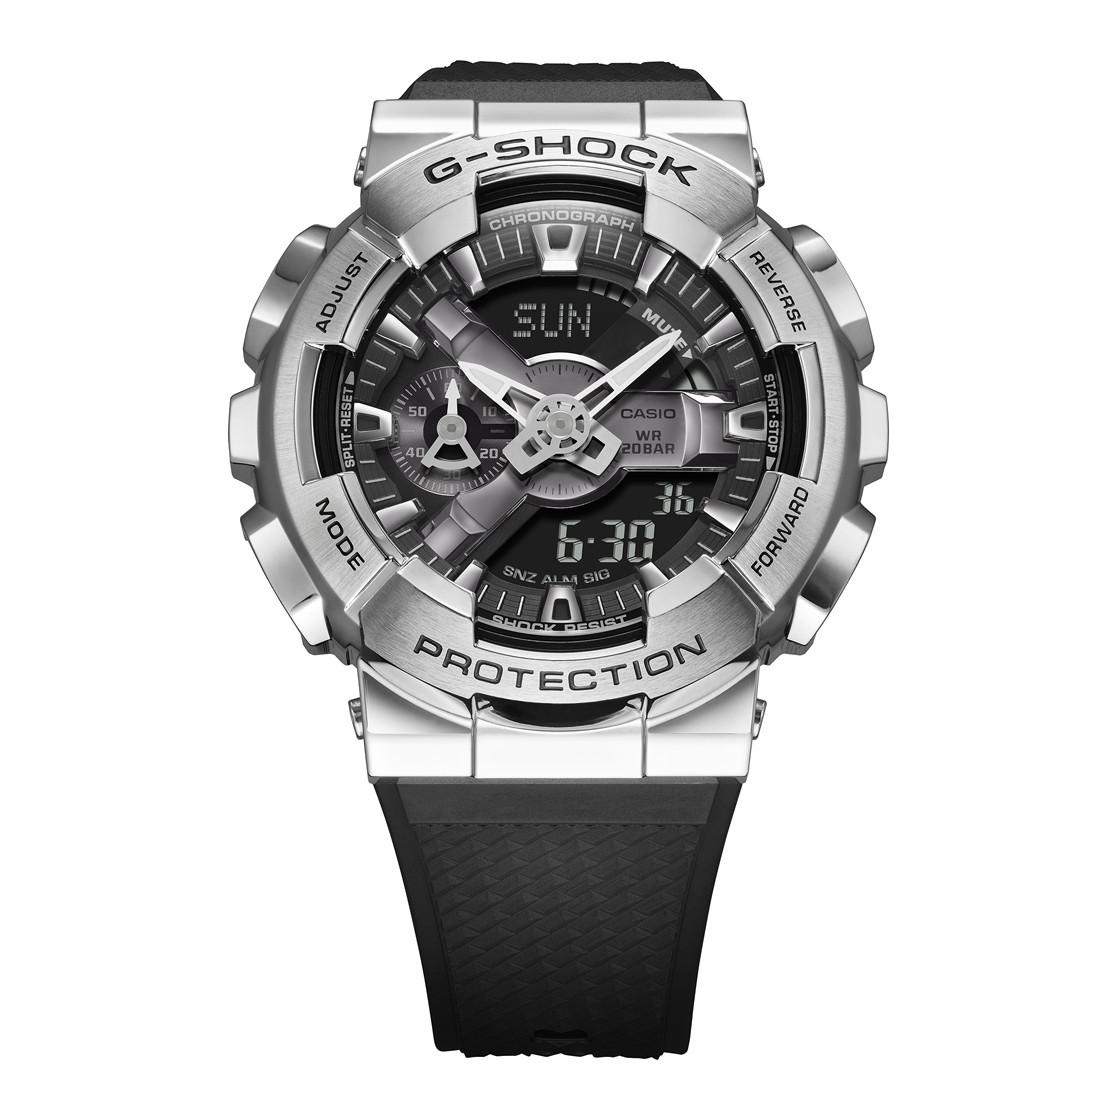 G-Shock Classic Chronograaf horloge GM-110-1AER